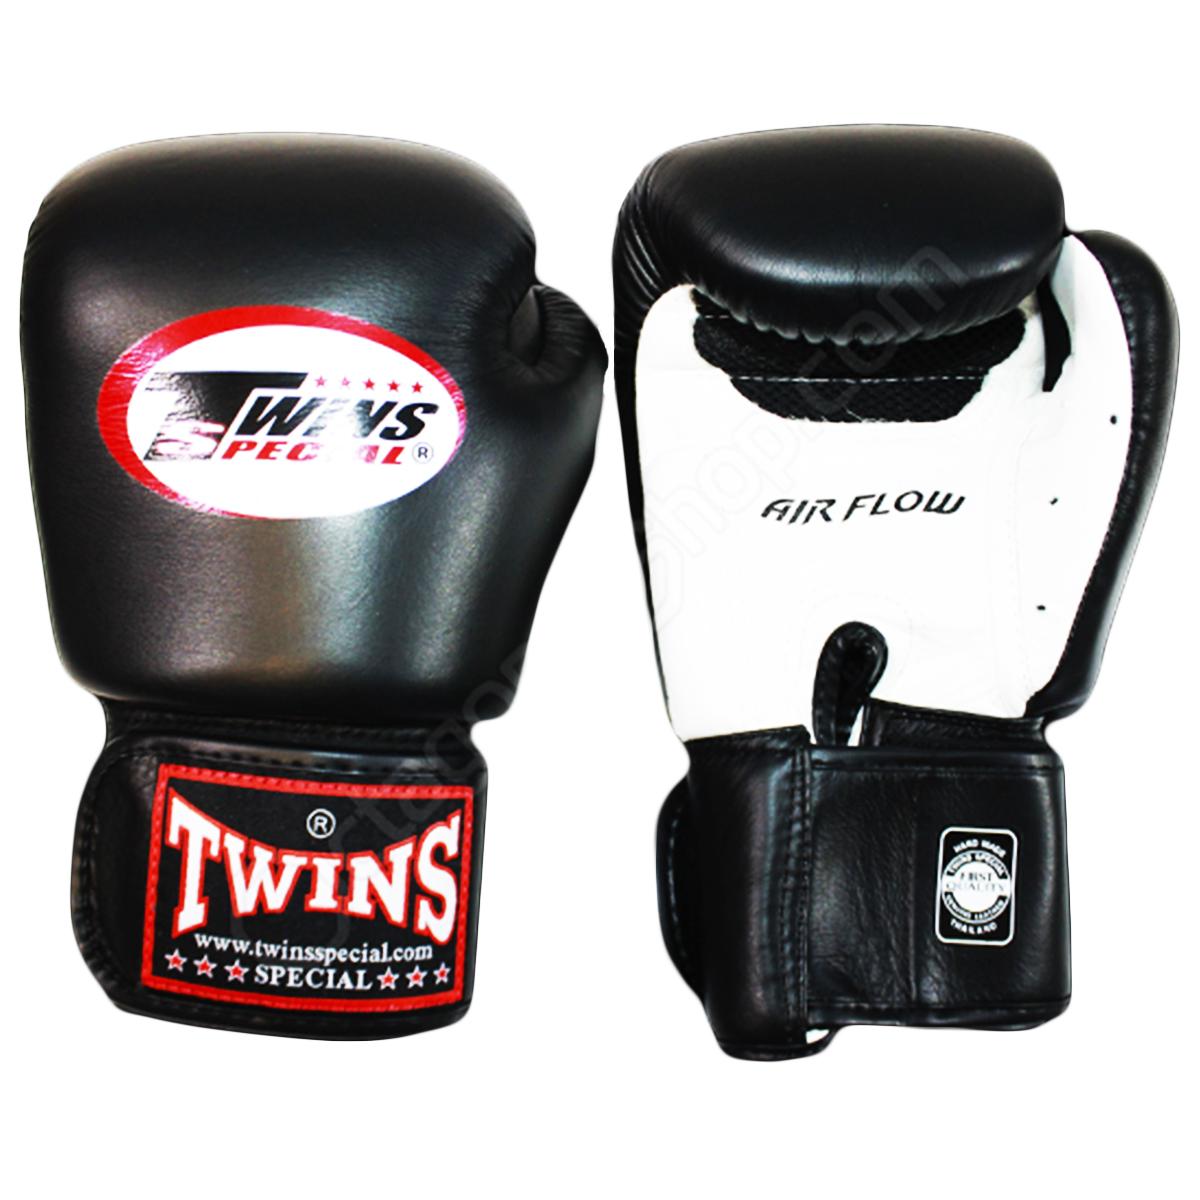 Купить Перчатки для бокса Twins Special BGVLA-2 Black/White, 3704_bk_wh